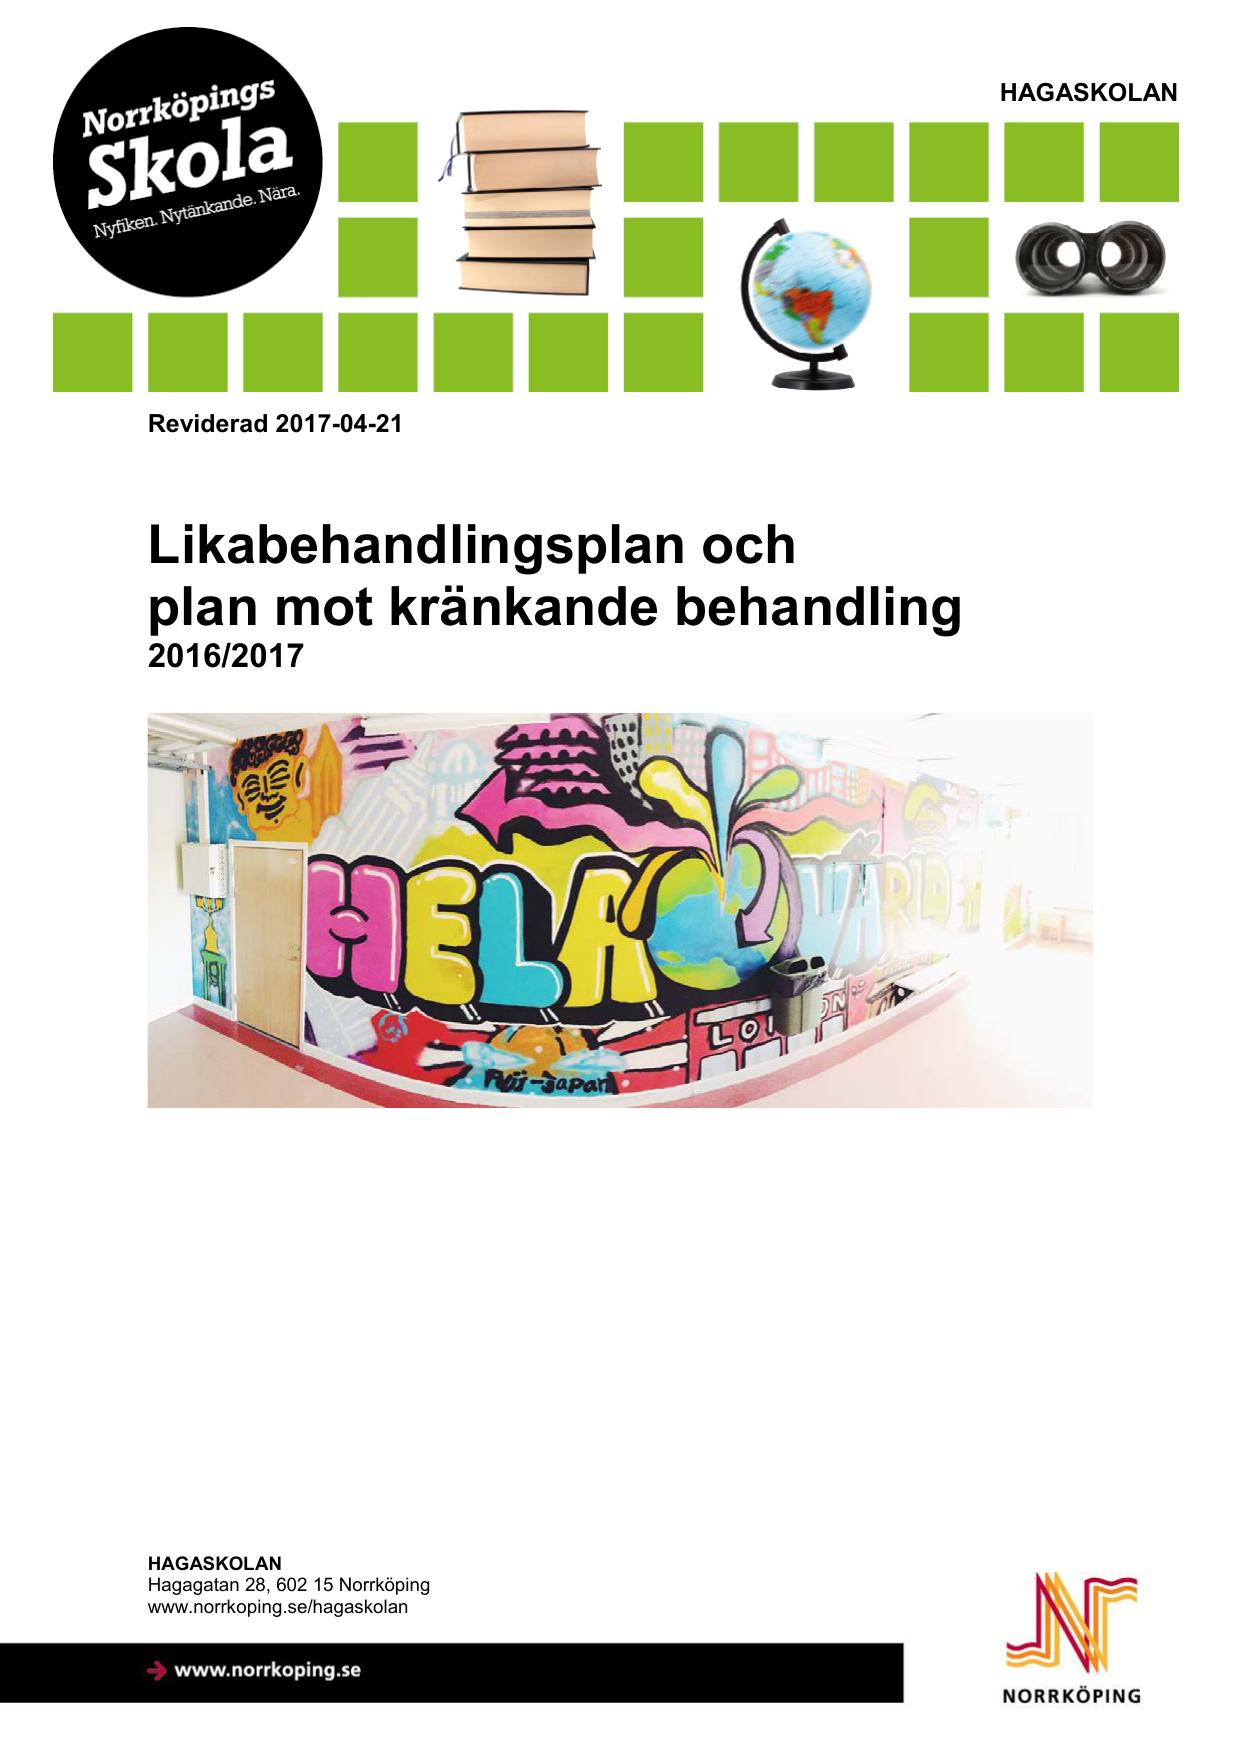 skolstart 2016 norrköping